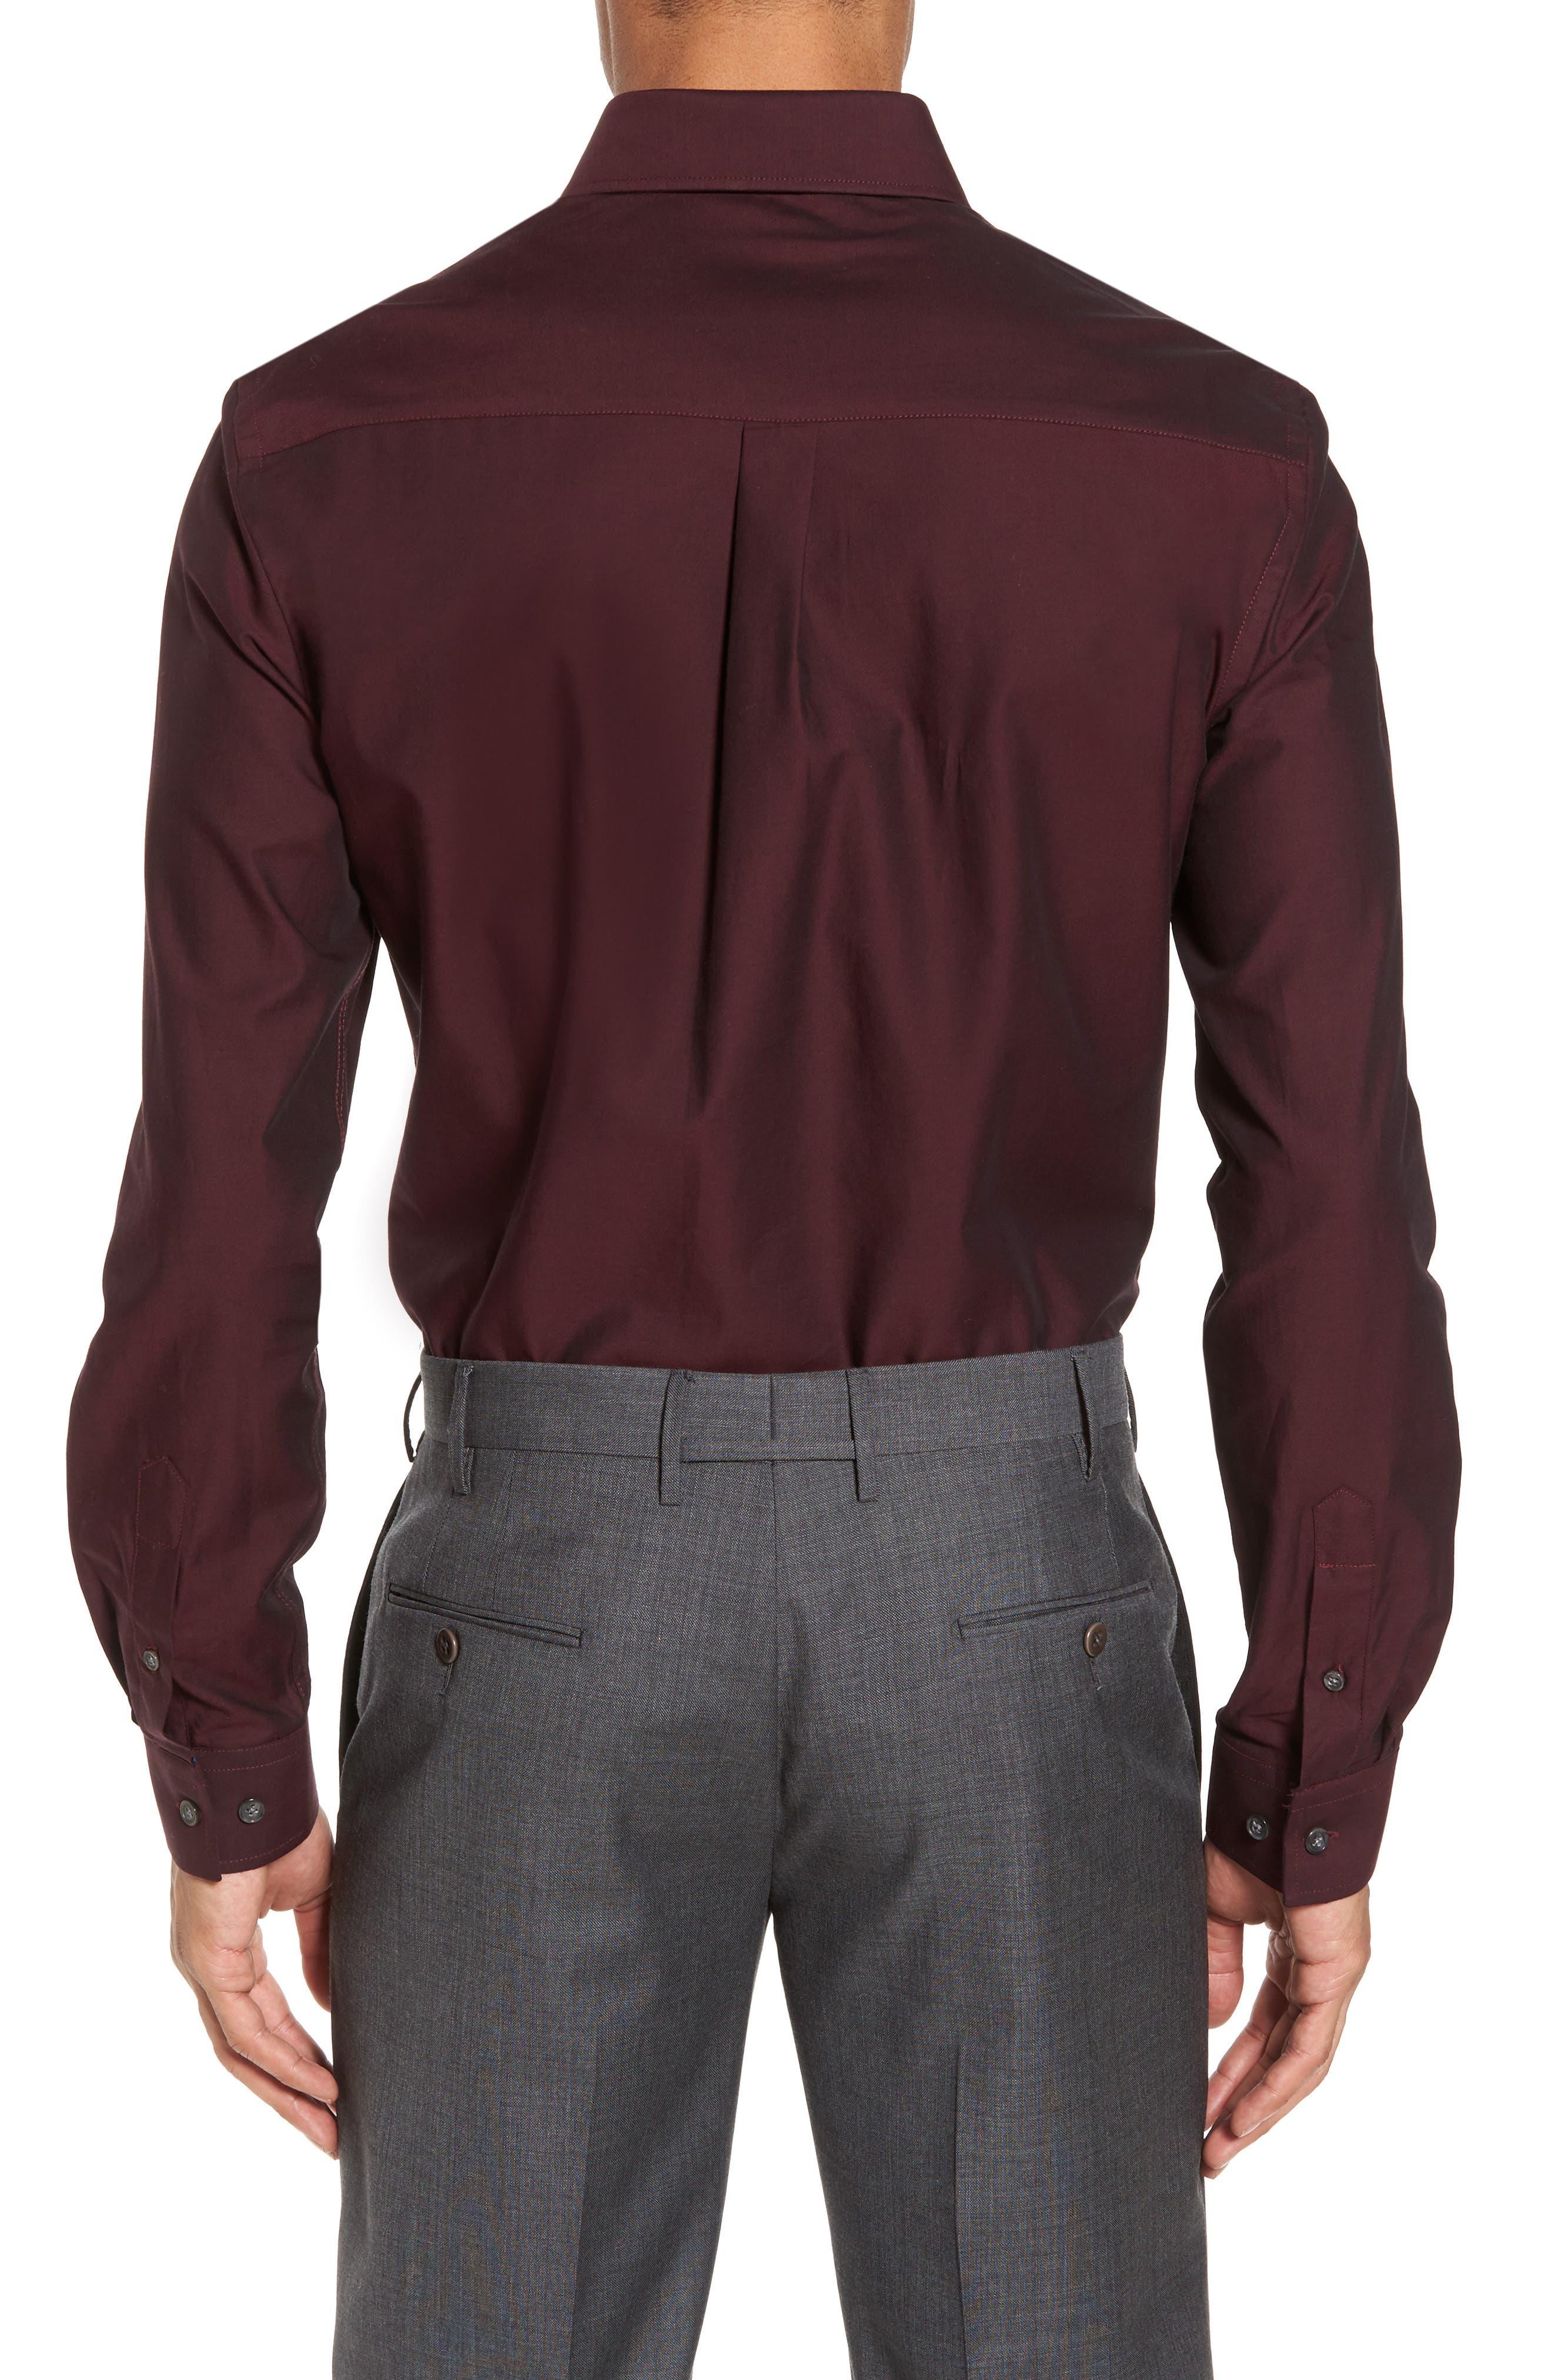 Trim Fit Solid Dress Shirt,                             Alternate thumbnail 2, color,                             Burgundy